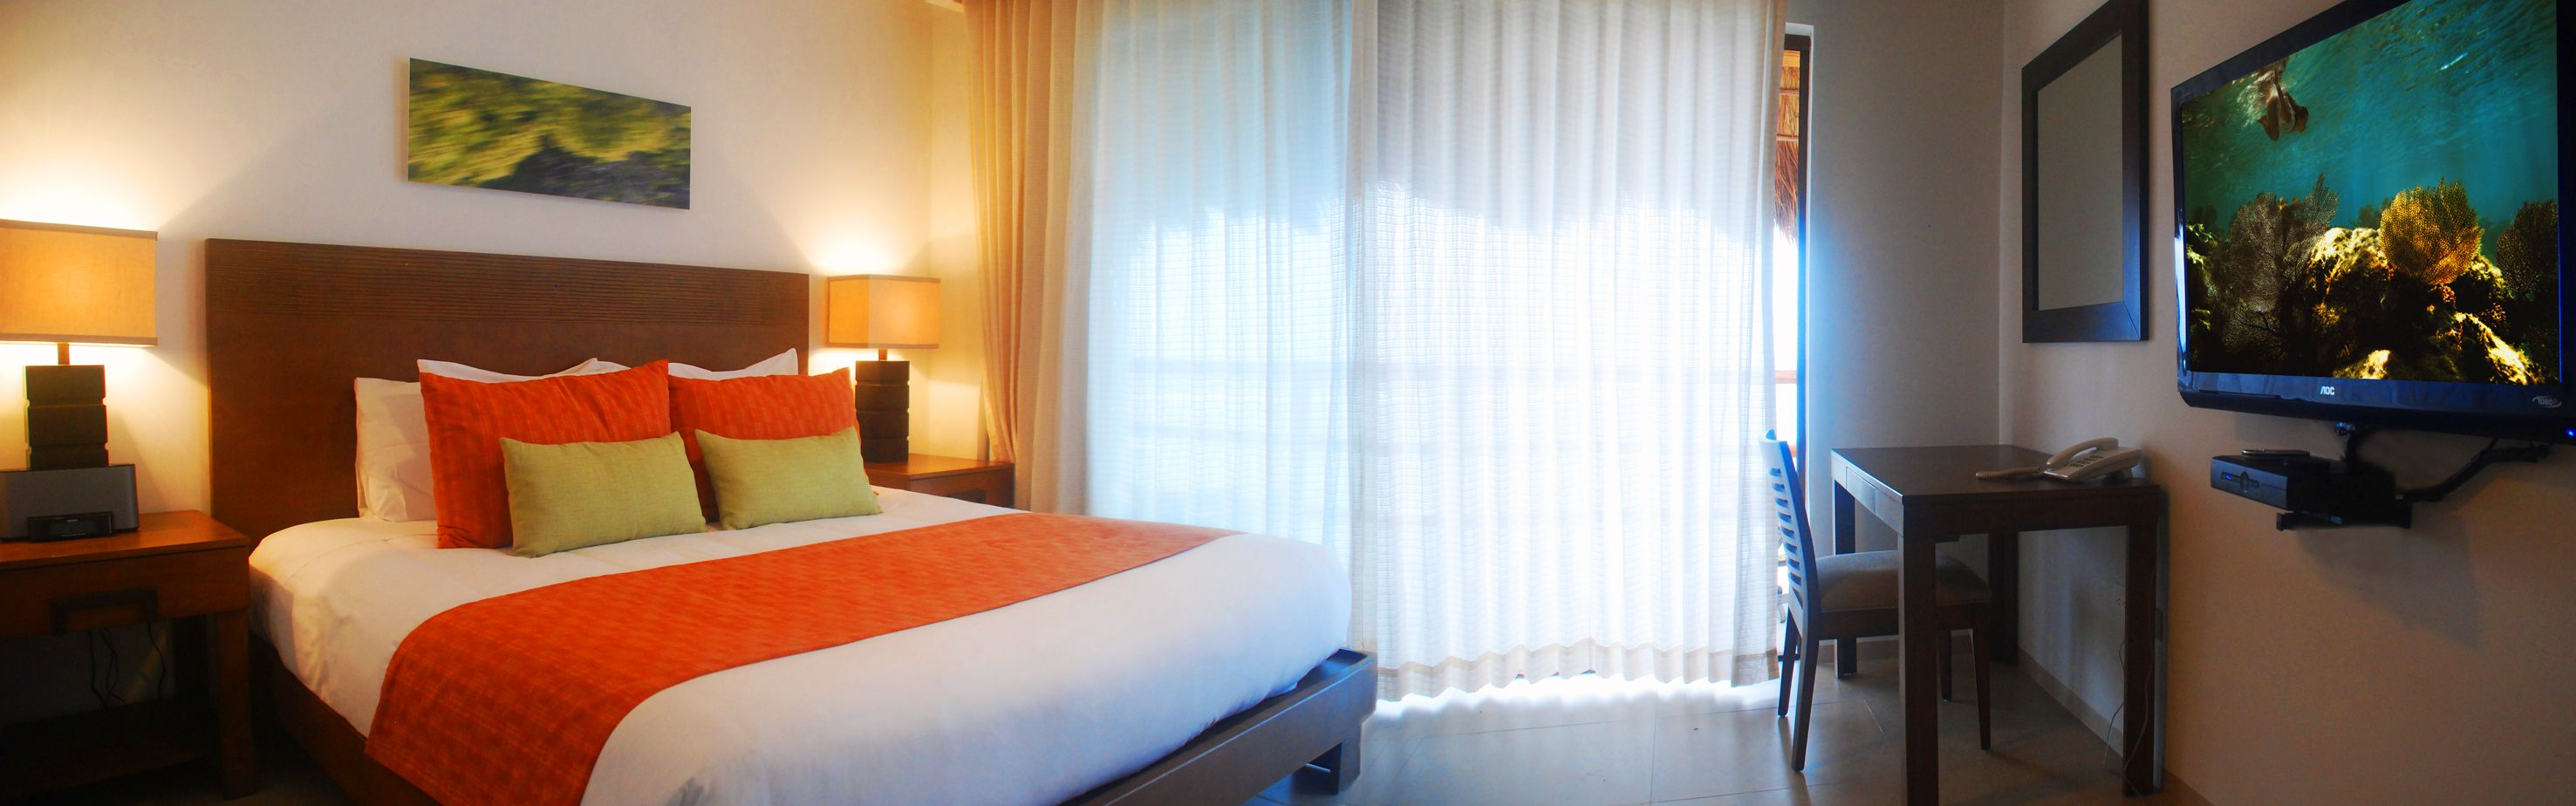 Mahahual Hotel Majahual  Hotel Quinto Sole